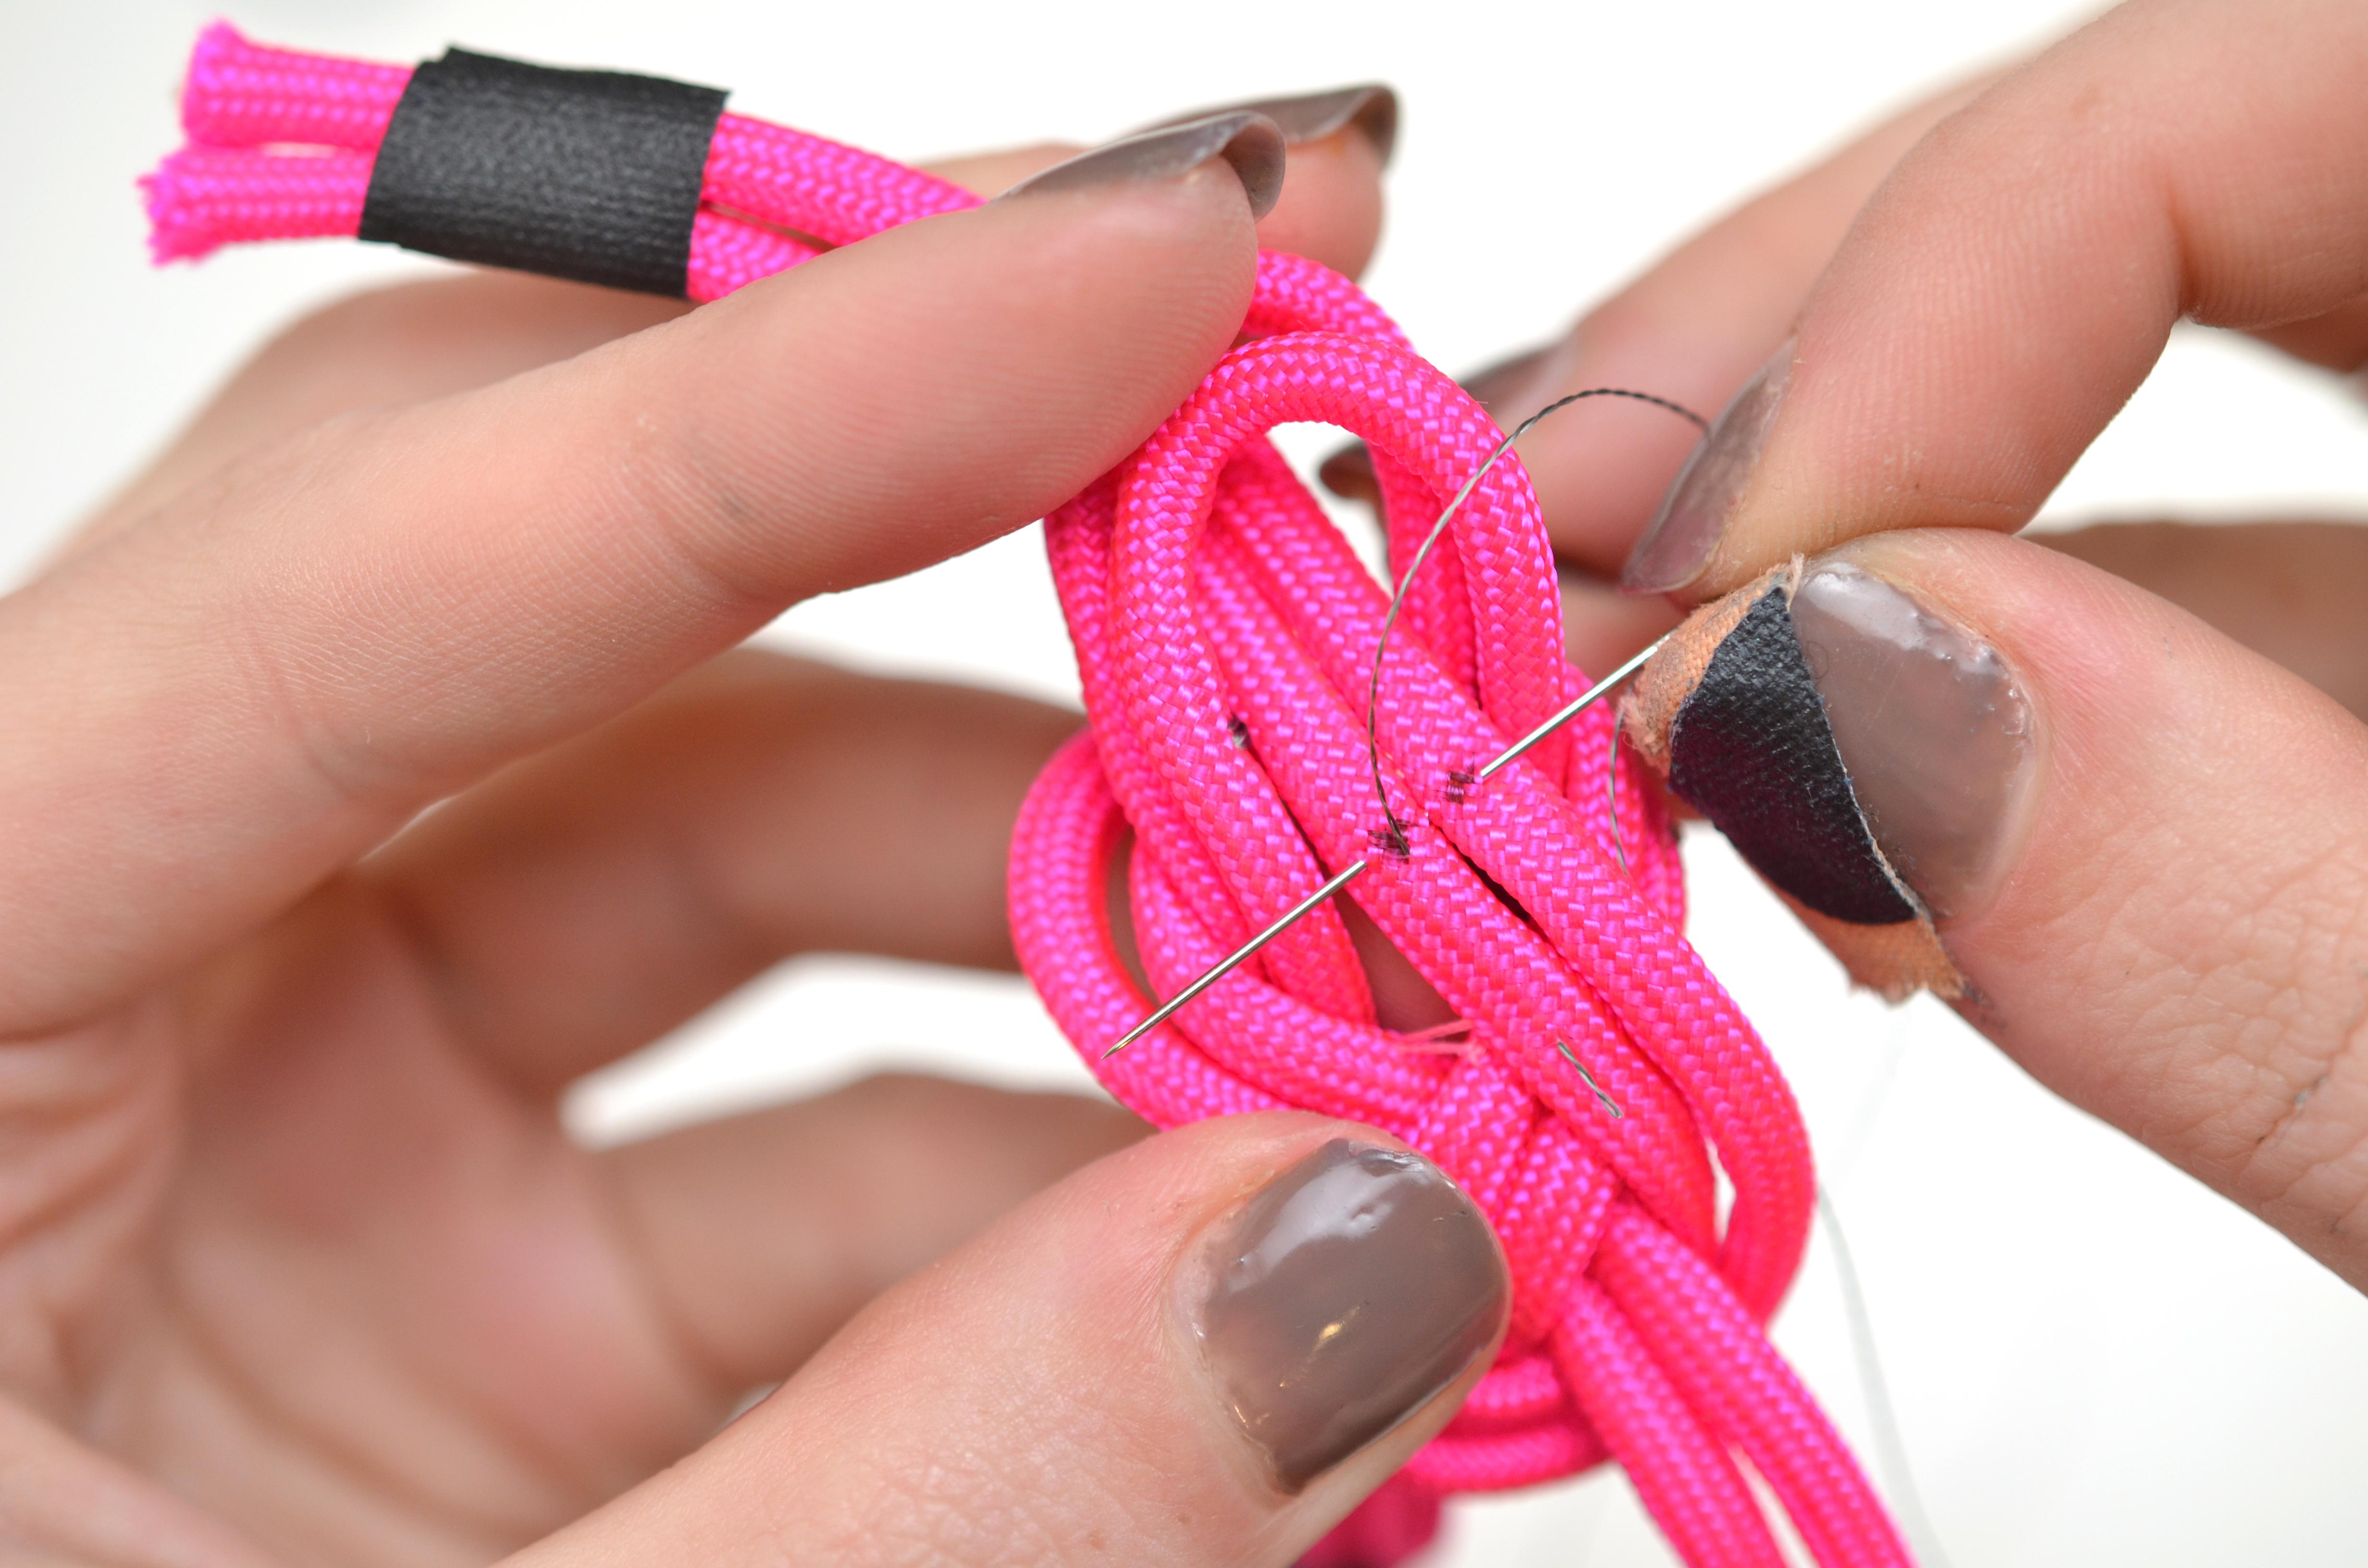 leds_nautical-paracord-led-sequin-friendship-bracelet-24.jpg